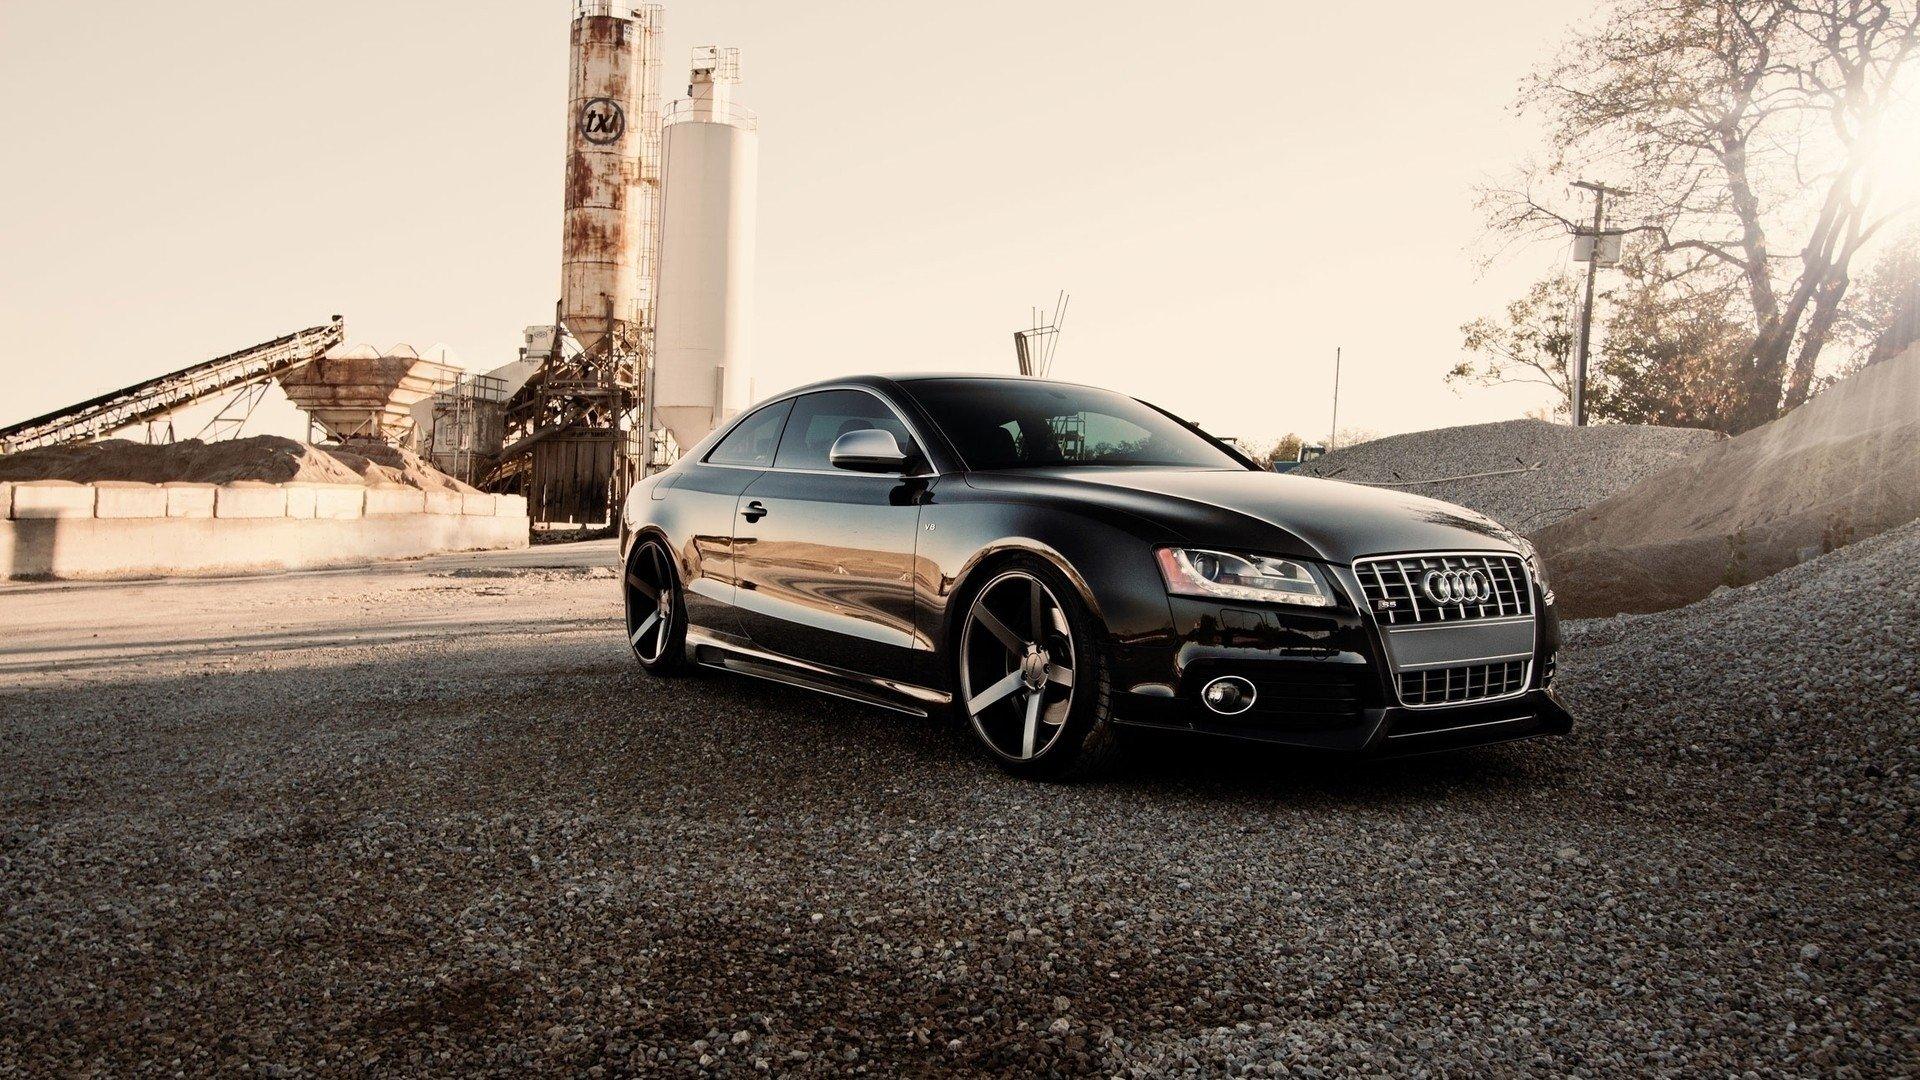 Audi Full HD Wallpaper and Background 1920x1080 ID378782